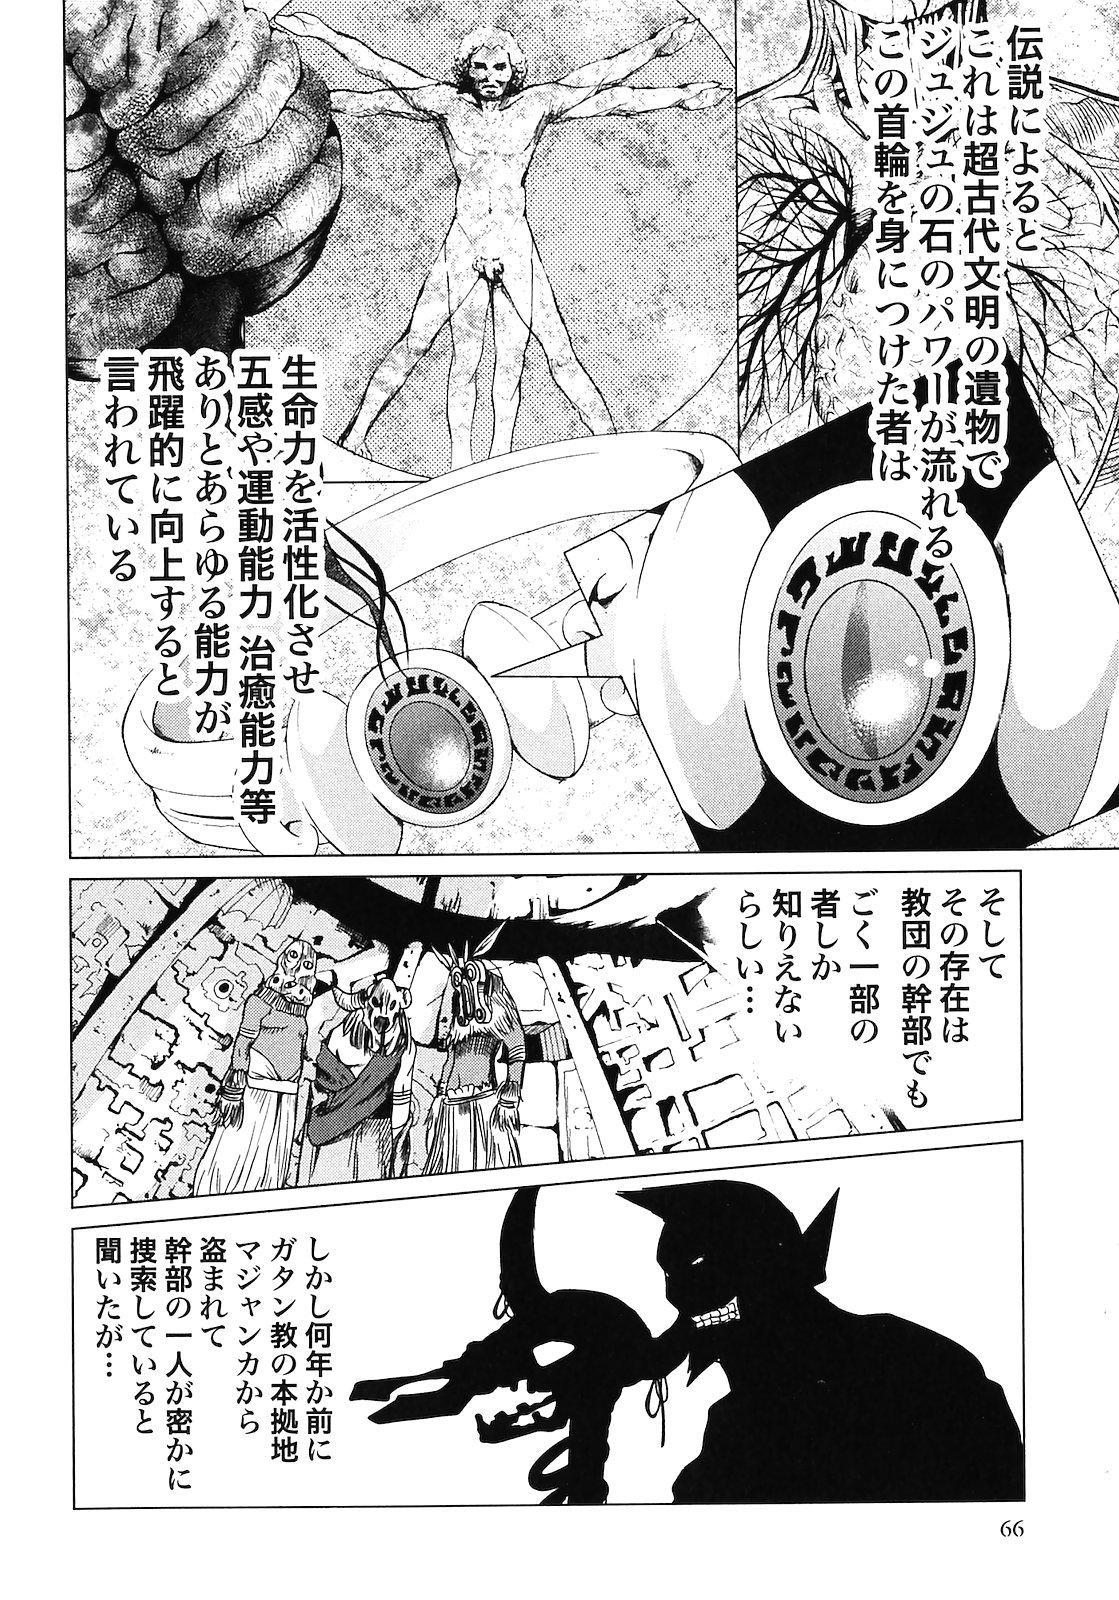 Makyo no Shanana Vol.02 67